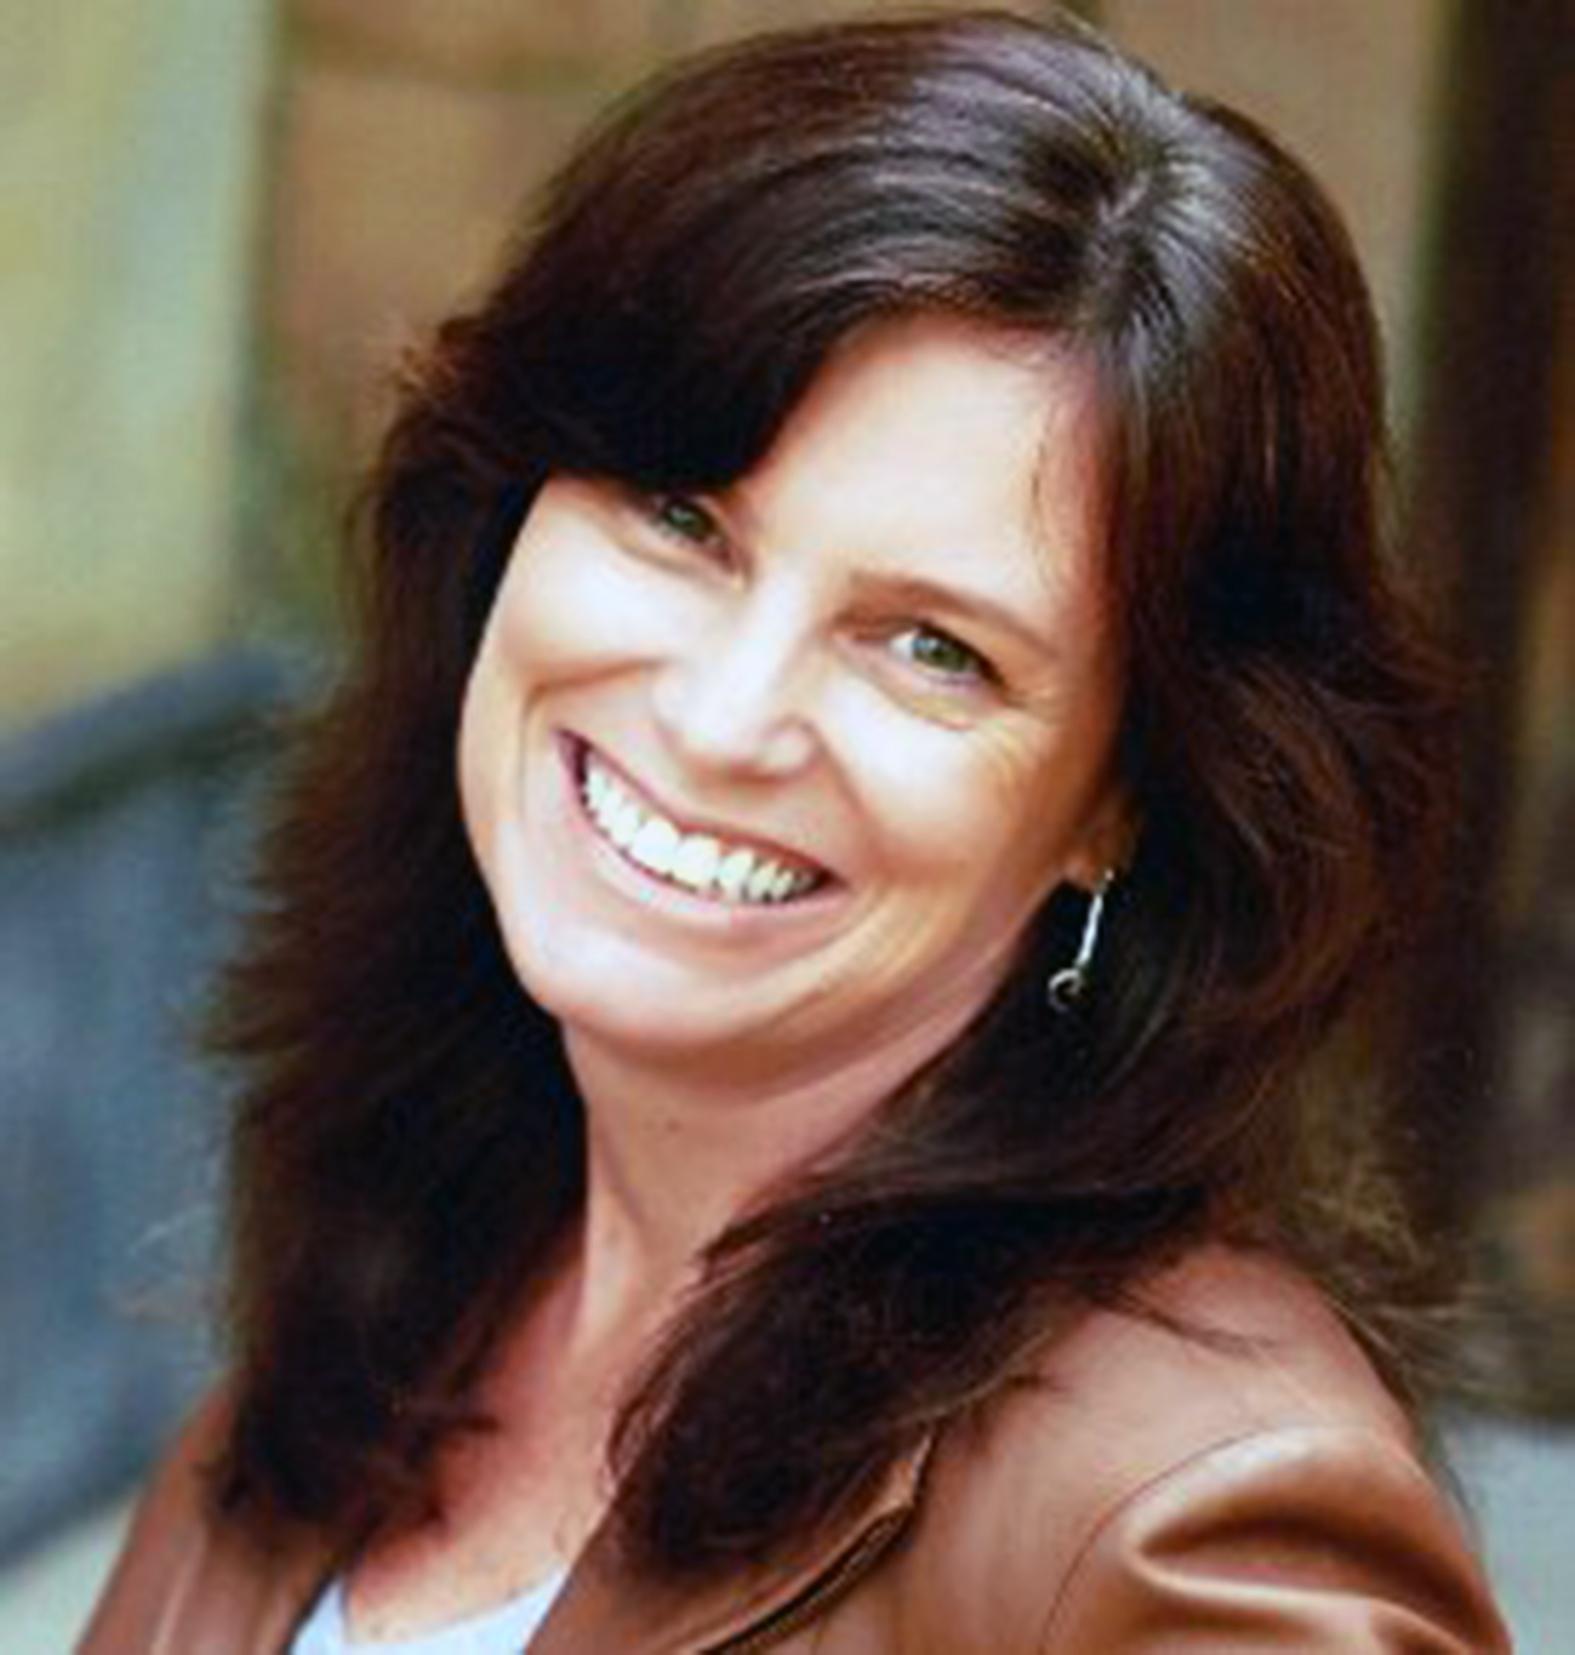 Dr Michelle Christy is the keynote speaker at the City's Invasive Species Interrogation Forum next week.